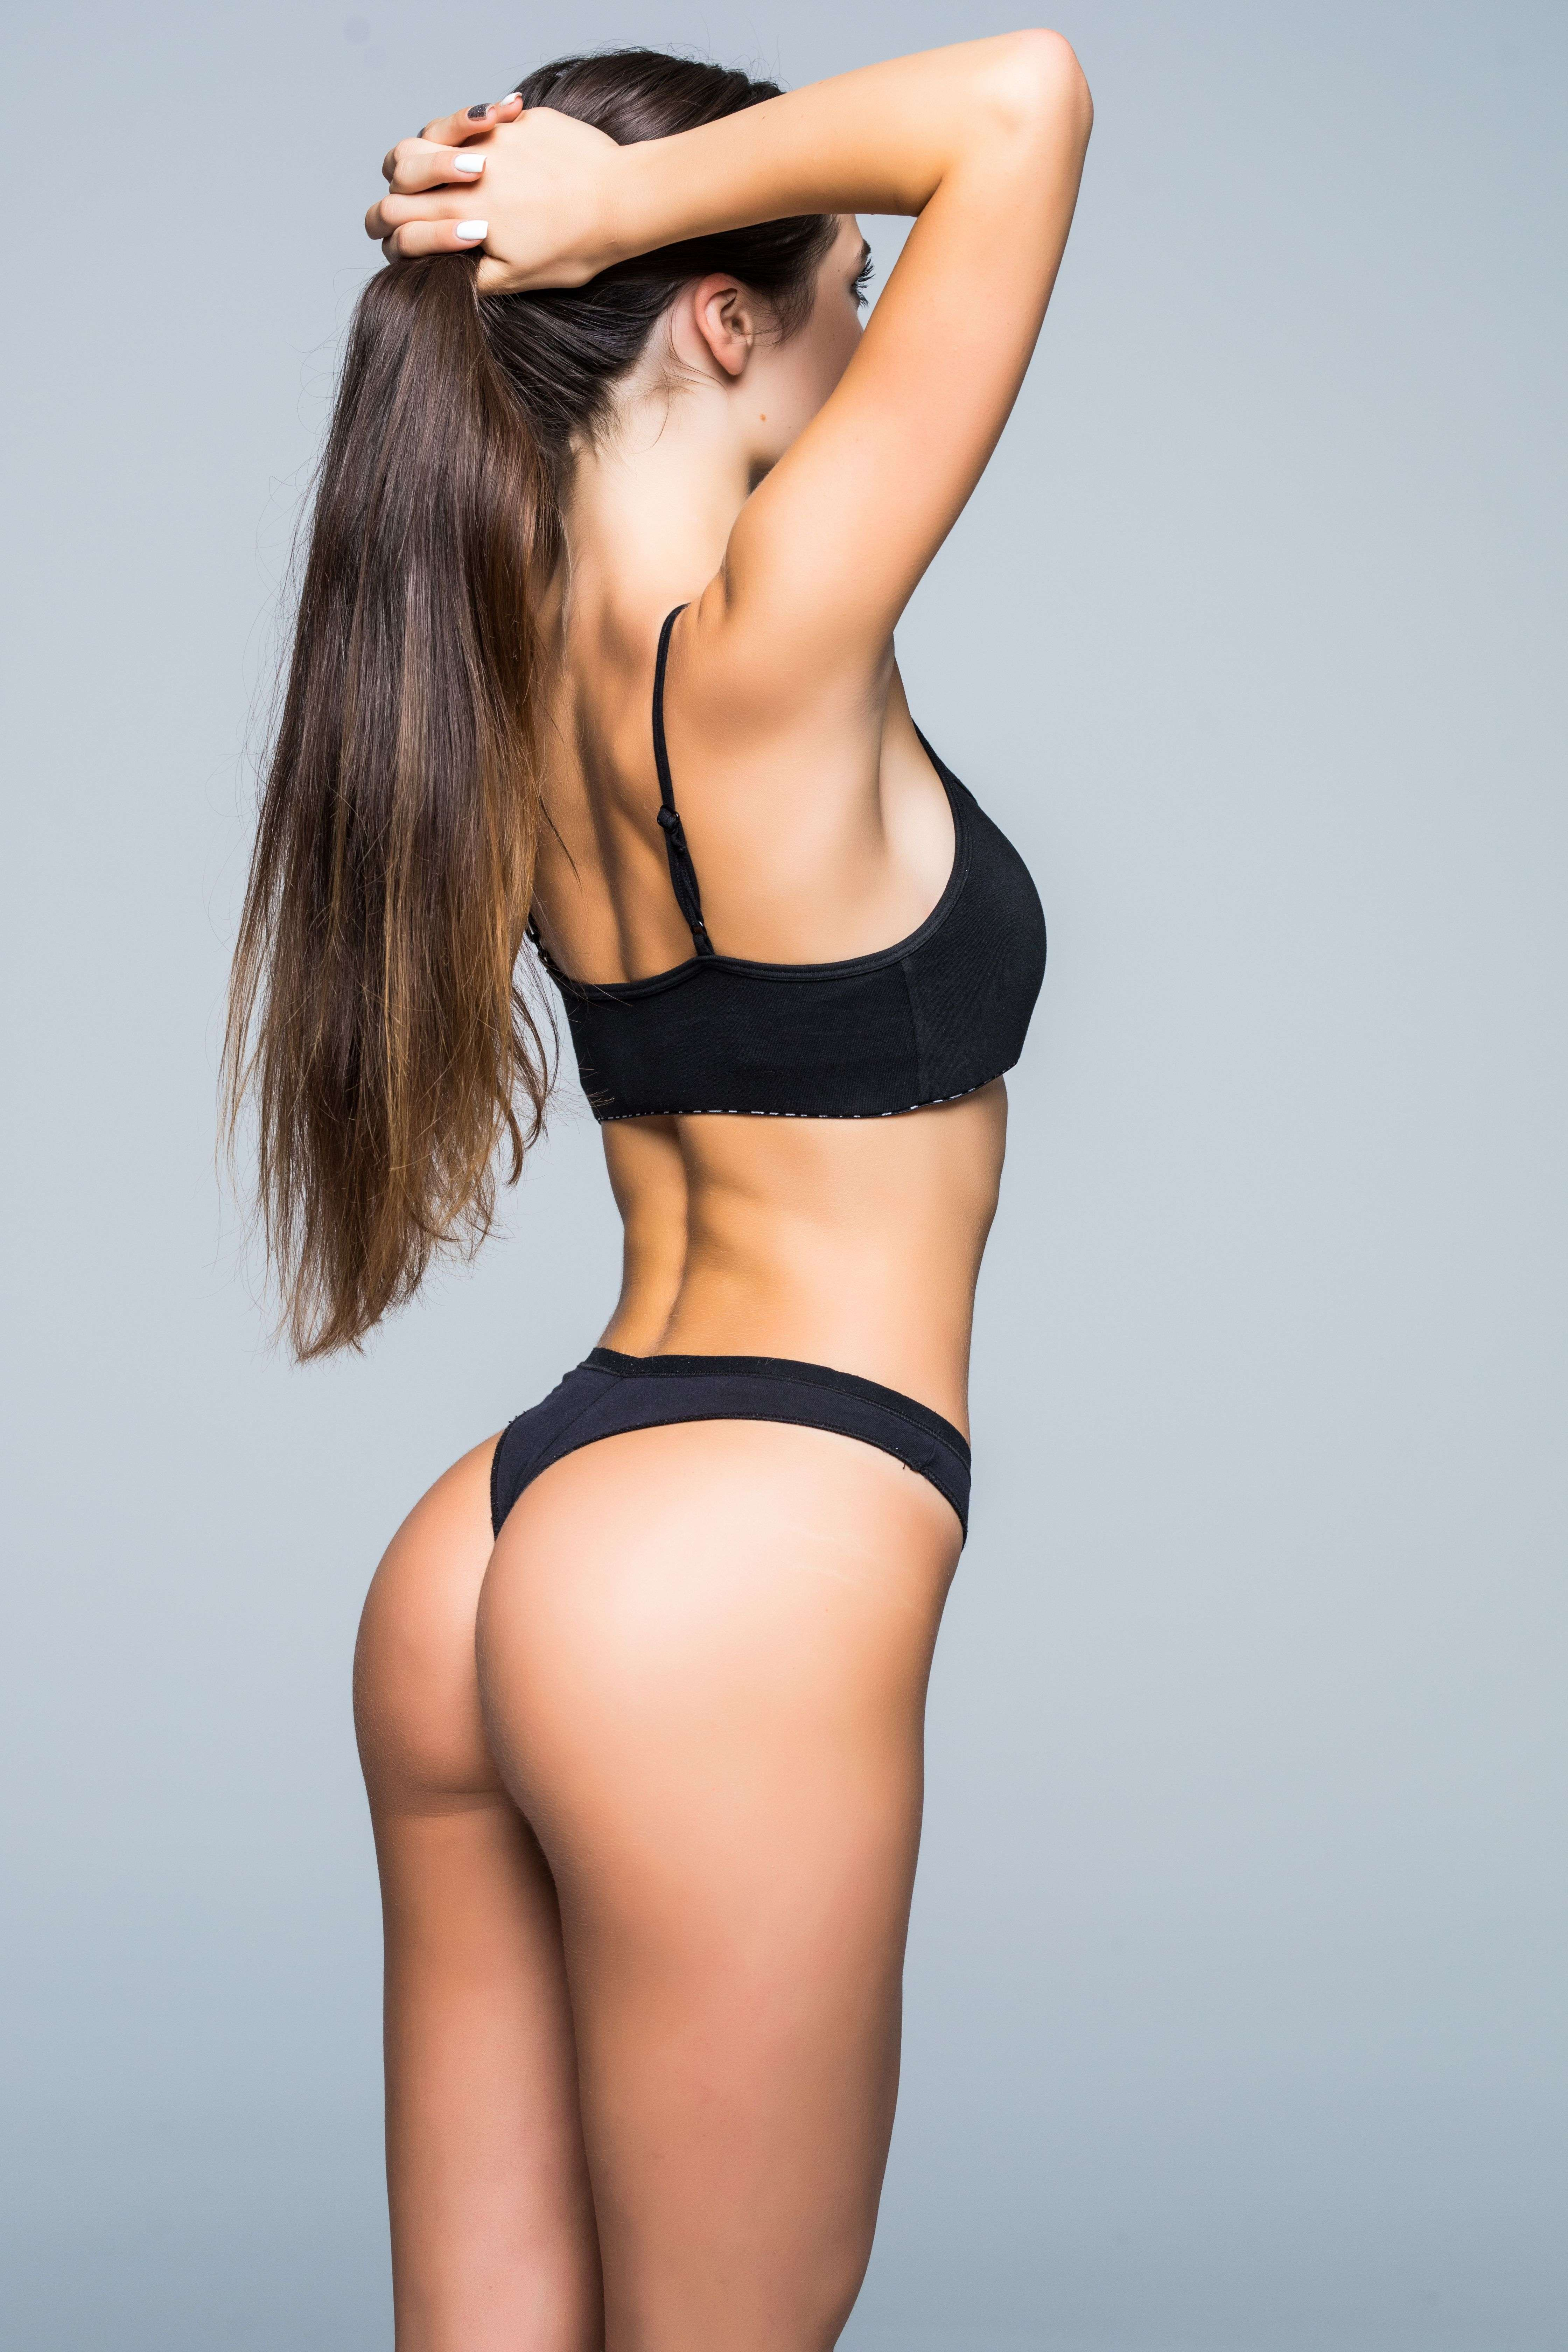 Lifting colombien fesse / poitrine